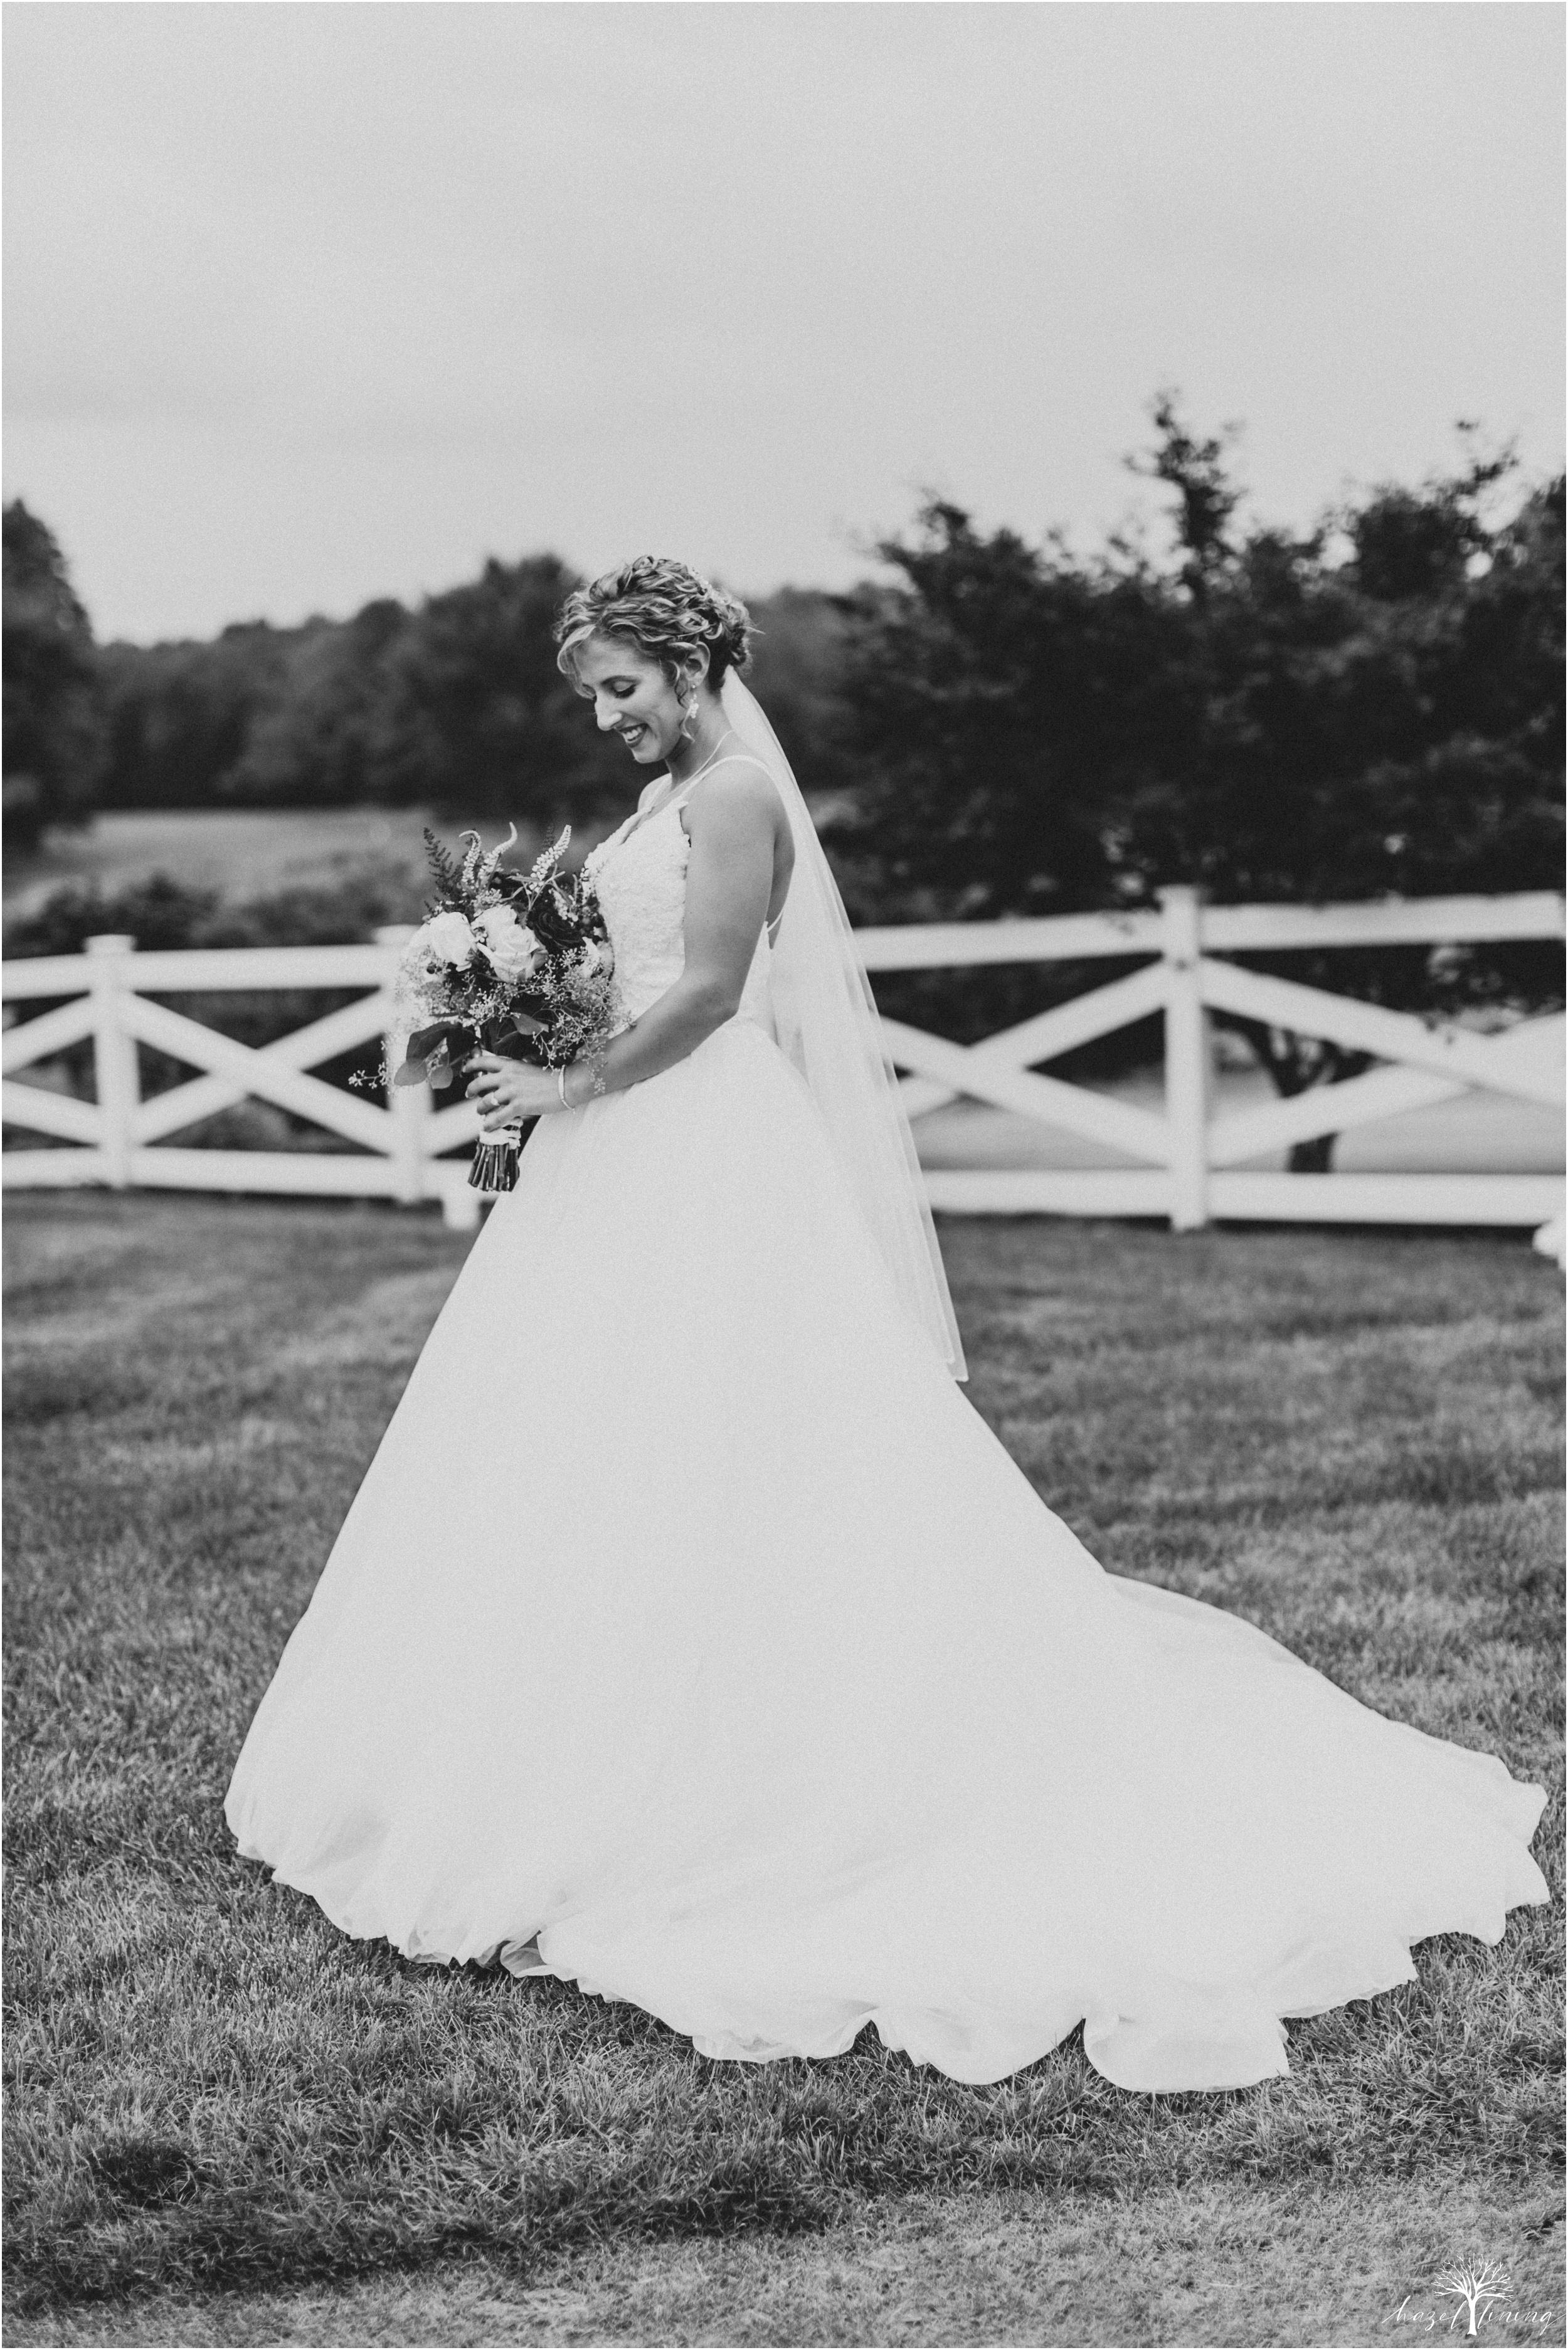 jonathan-weibel-becky-haywood-loft-at-sweetwater-cc-pennsburg-pennsylvania-rainy-day-summer-wedding-hazel-lining-travel-wedding-elopement-photography_0031.jpg